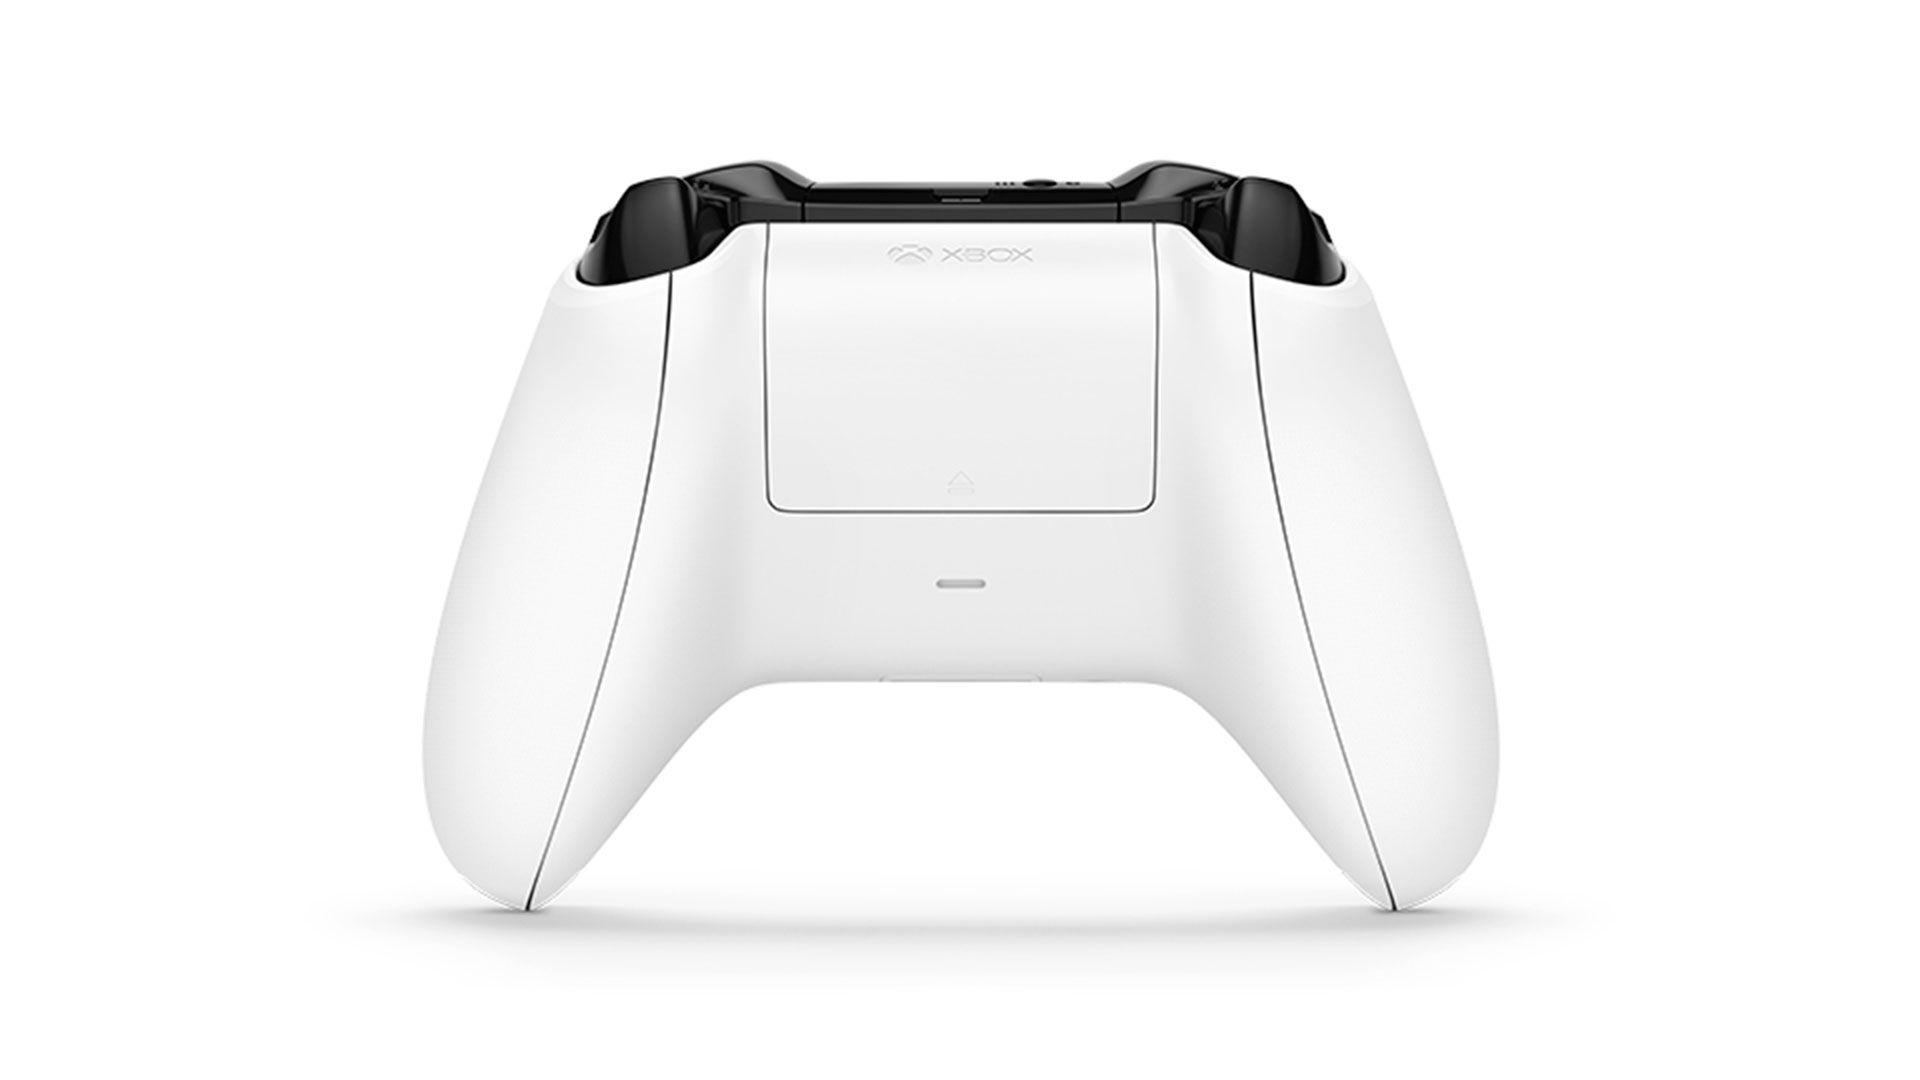 Xbox One белый геймпад изображение 2